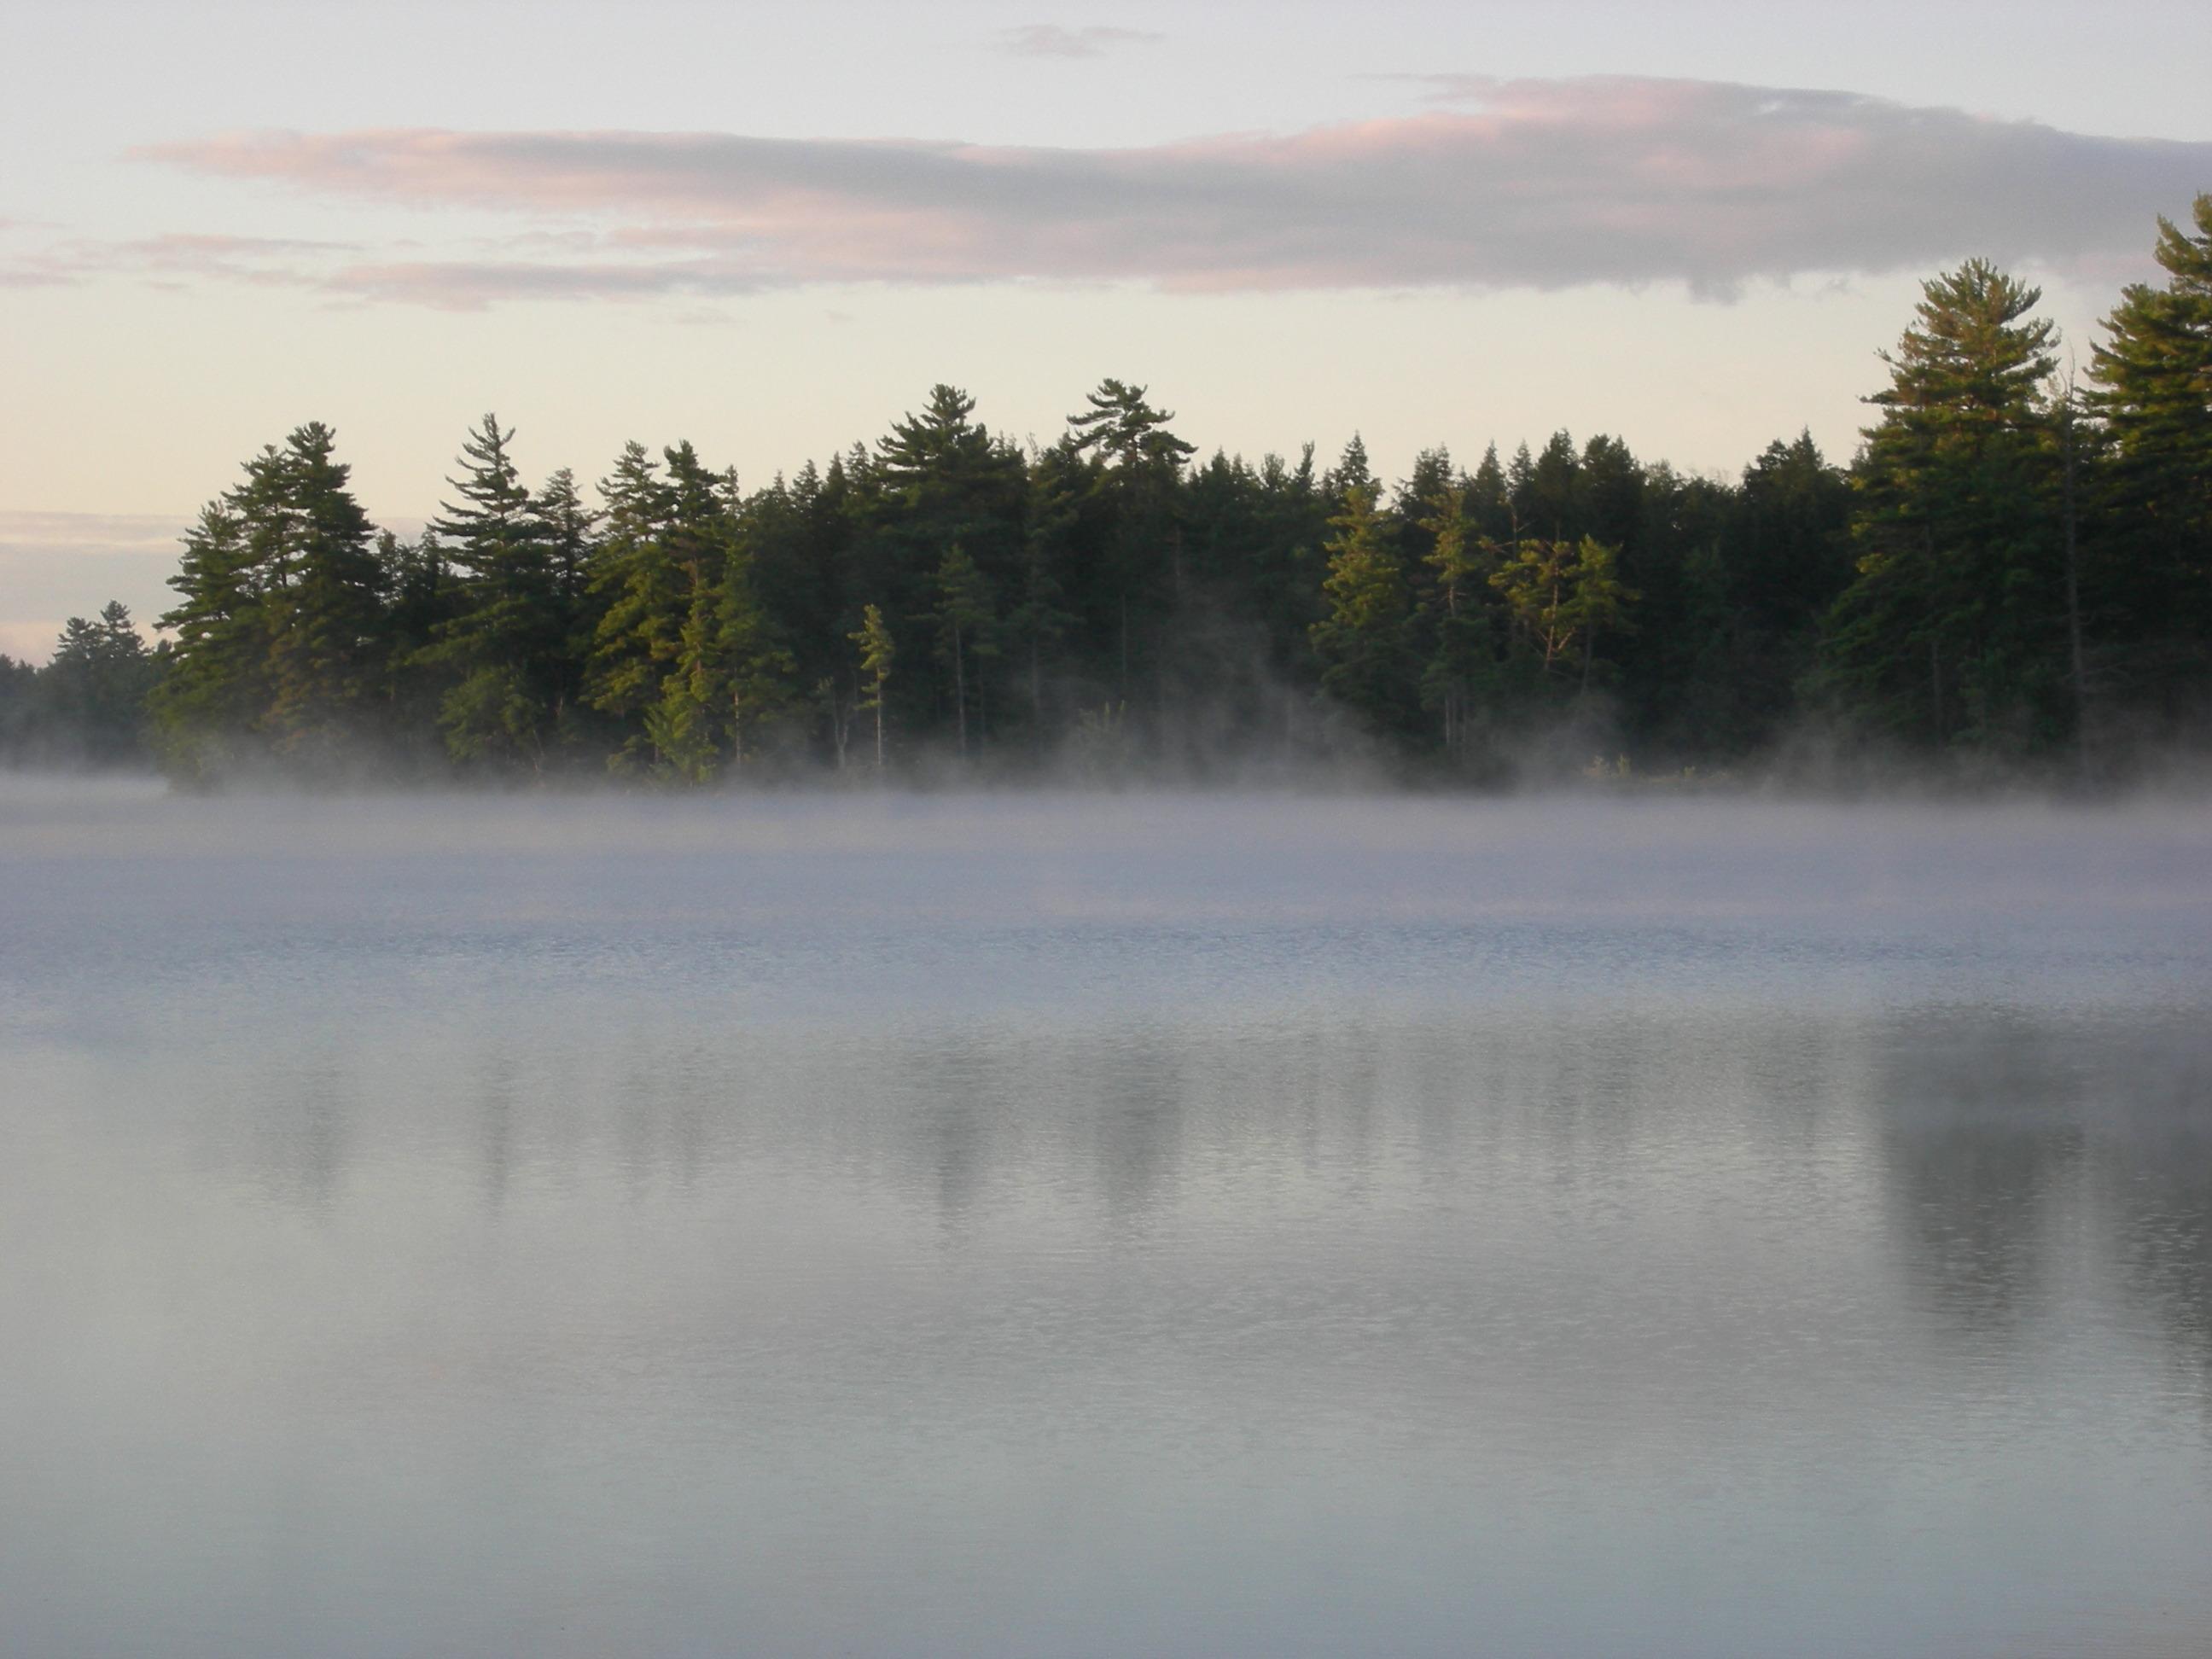 August dawn on Lake Wicwas - Marie Dexter